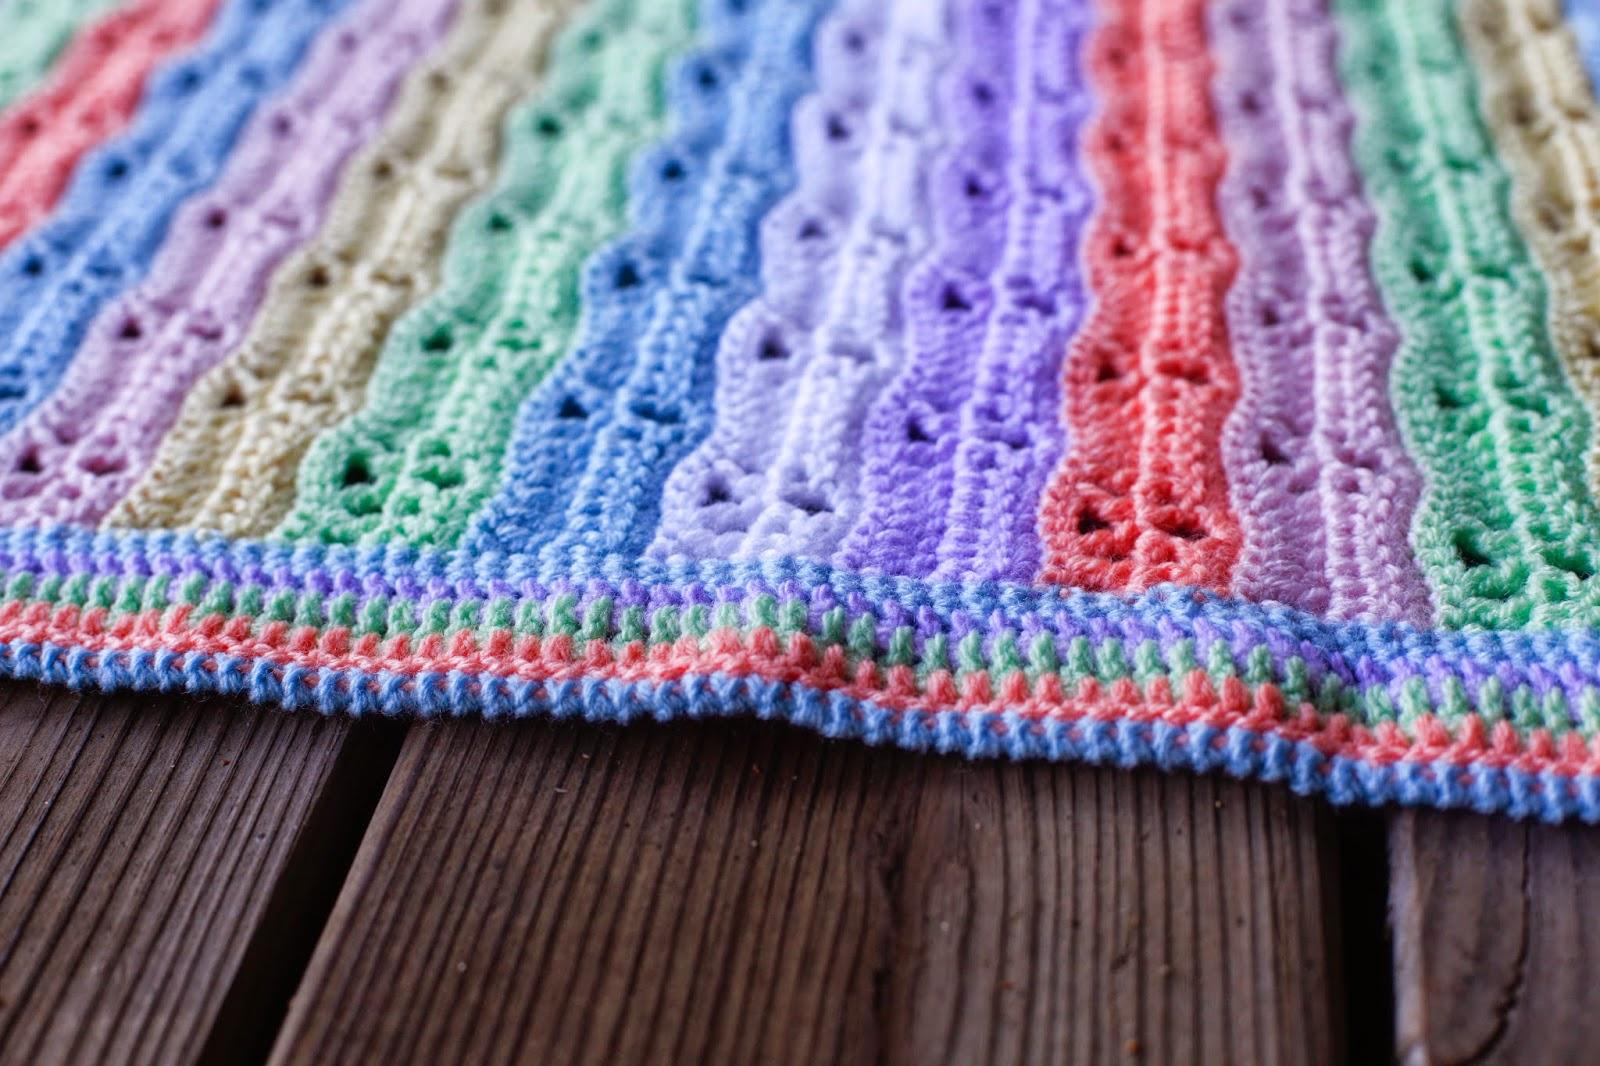 New Crochet Patterns : New Crochet Patterns for 2016